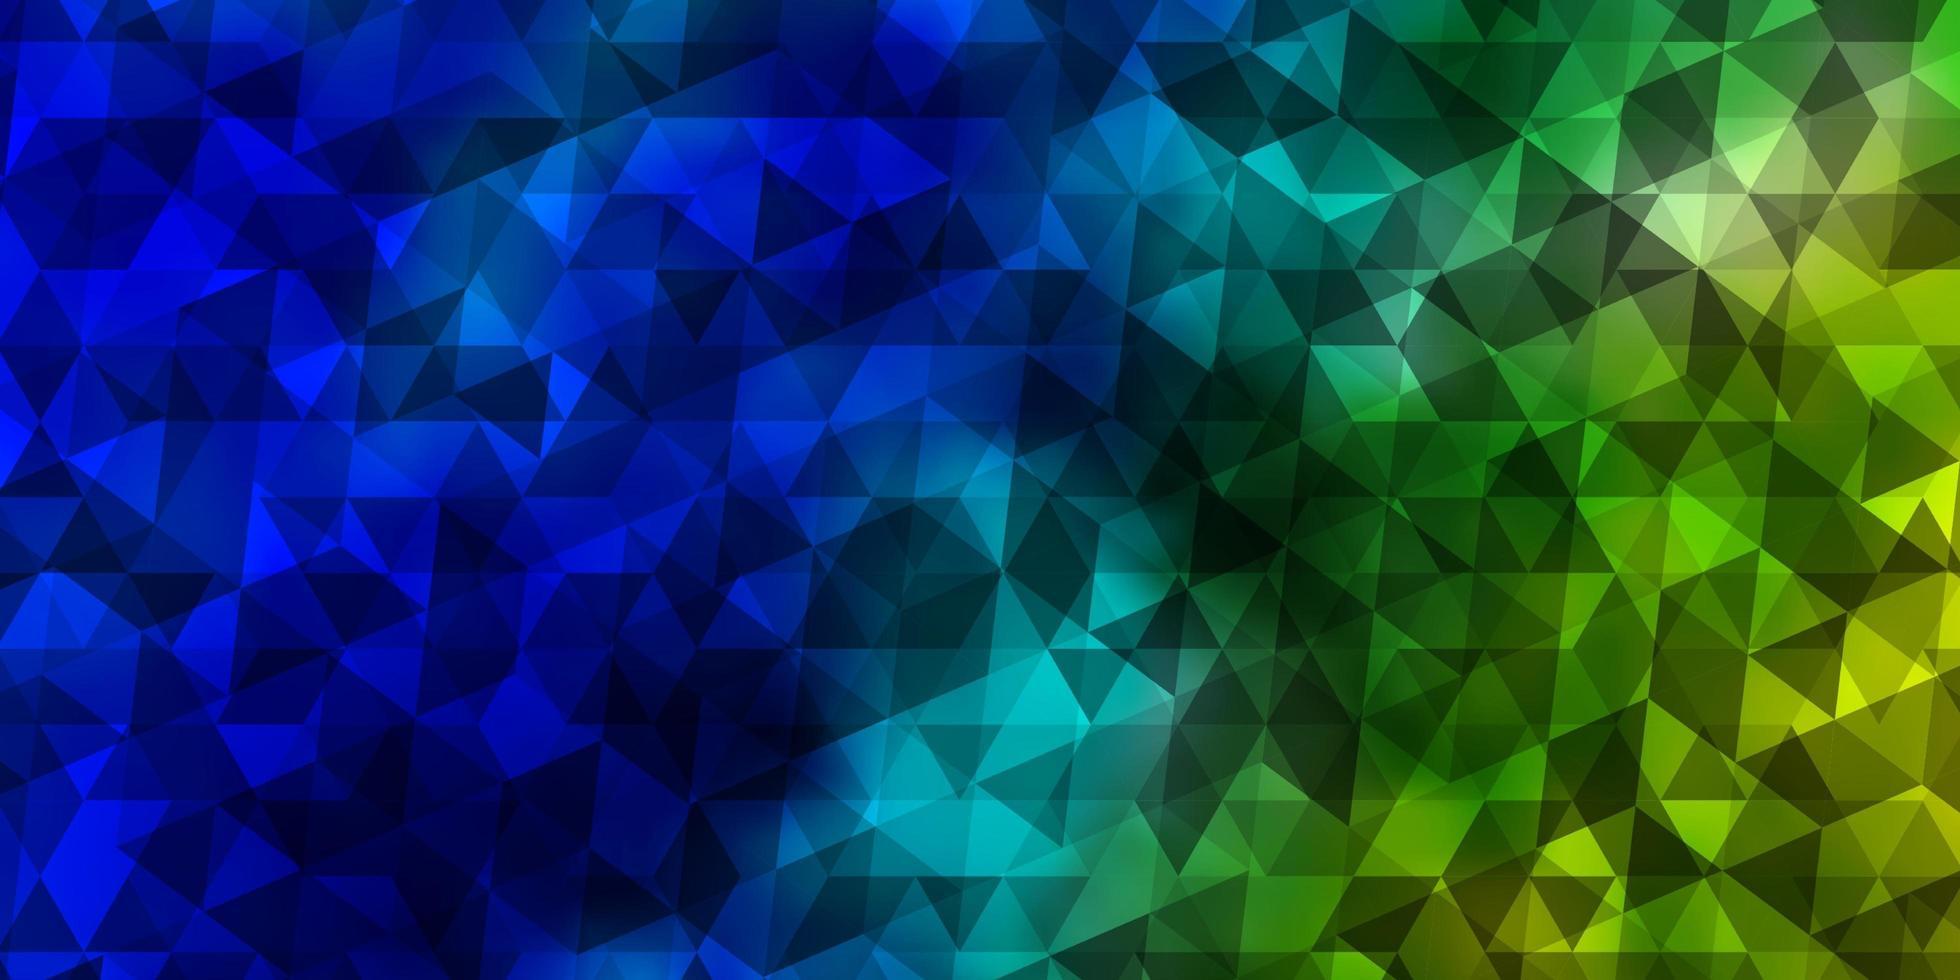 hellblaues, grünes Vektormuster mit polygonalem Stil. vektor